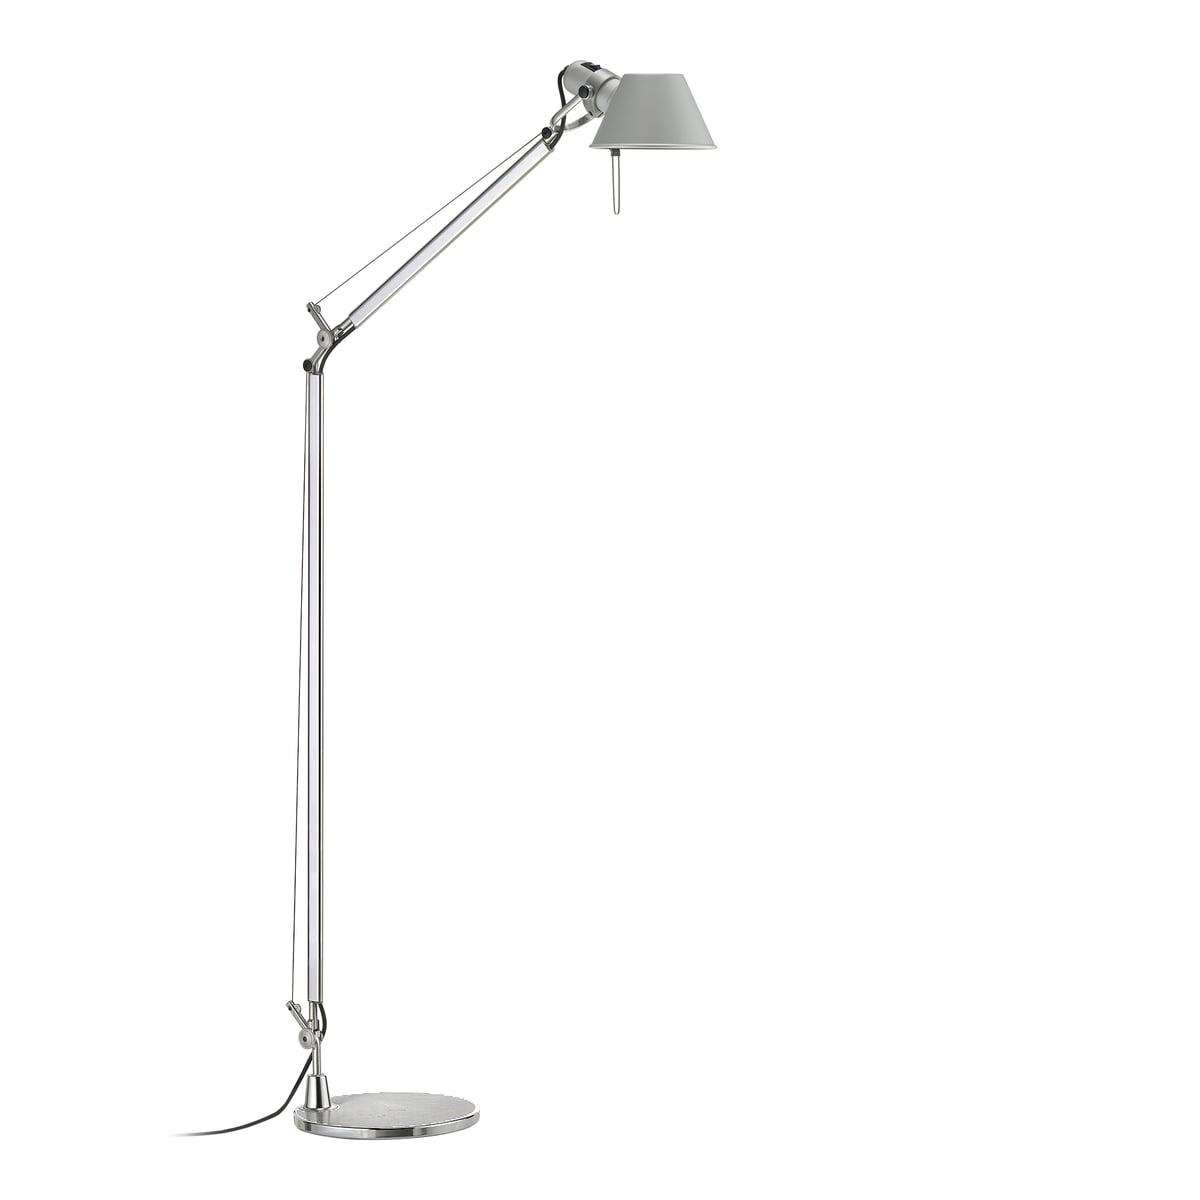 tolomeo lettura led floor lamp by artemide - artemide  tolomeo lettura floor lamp led